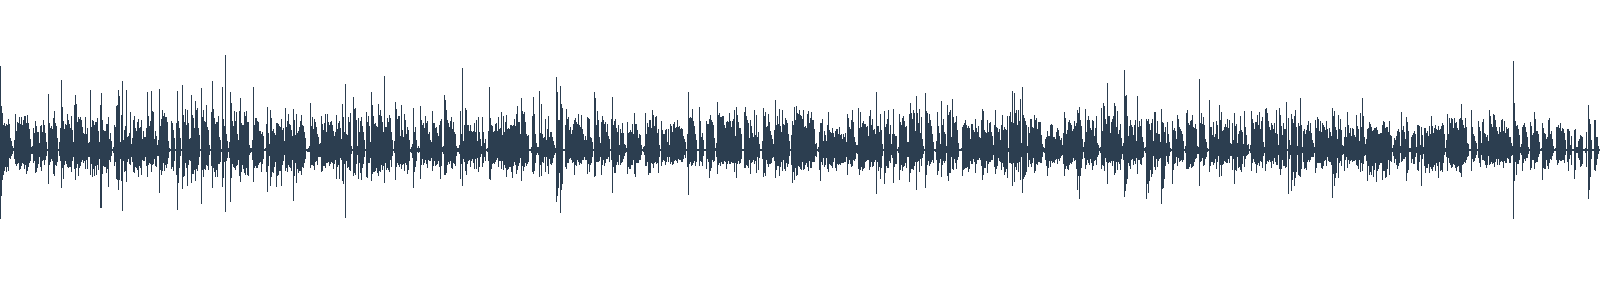 Polnočná banda waveform